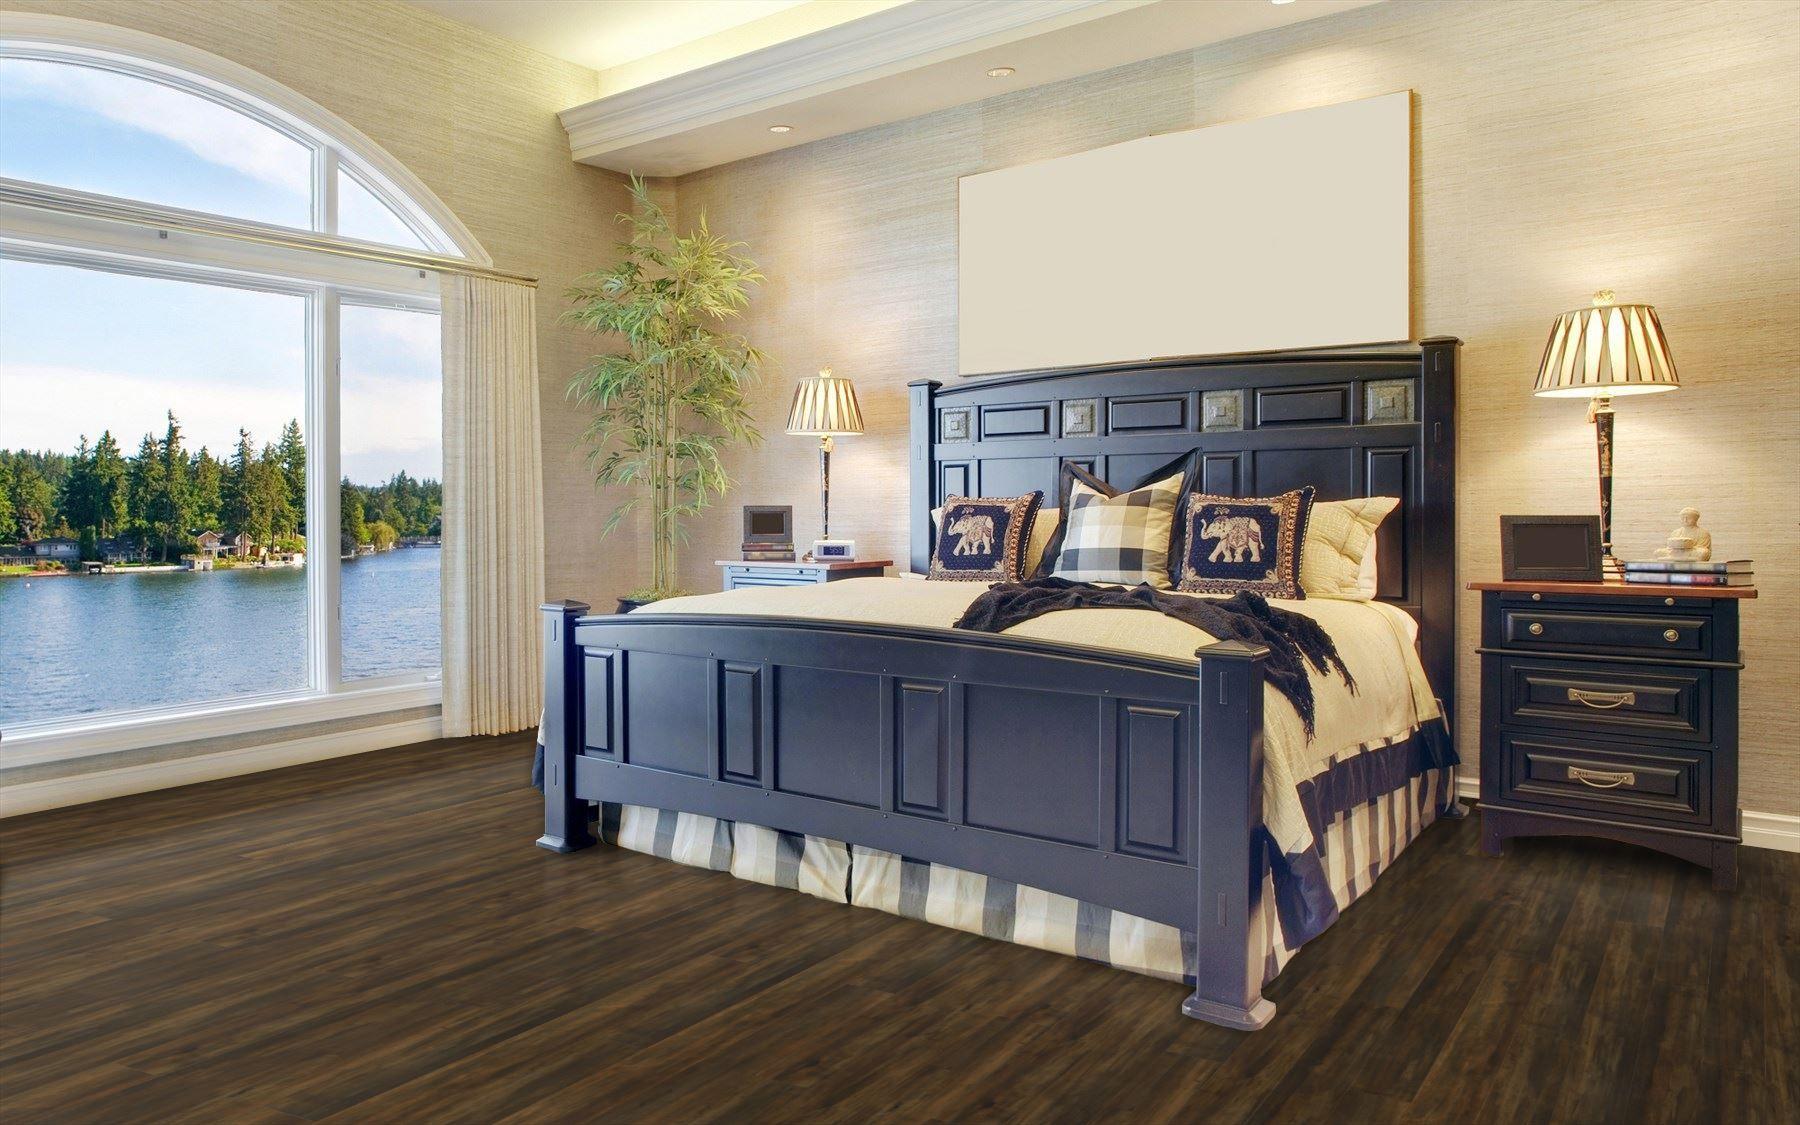 Standard Dark Maple Laminate Flooring Luxury Bedroom Master Master Bedroom Design Interior Design Bedroom